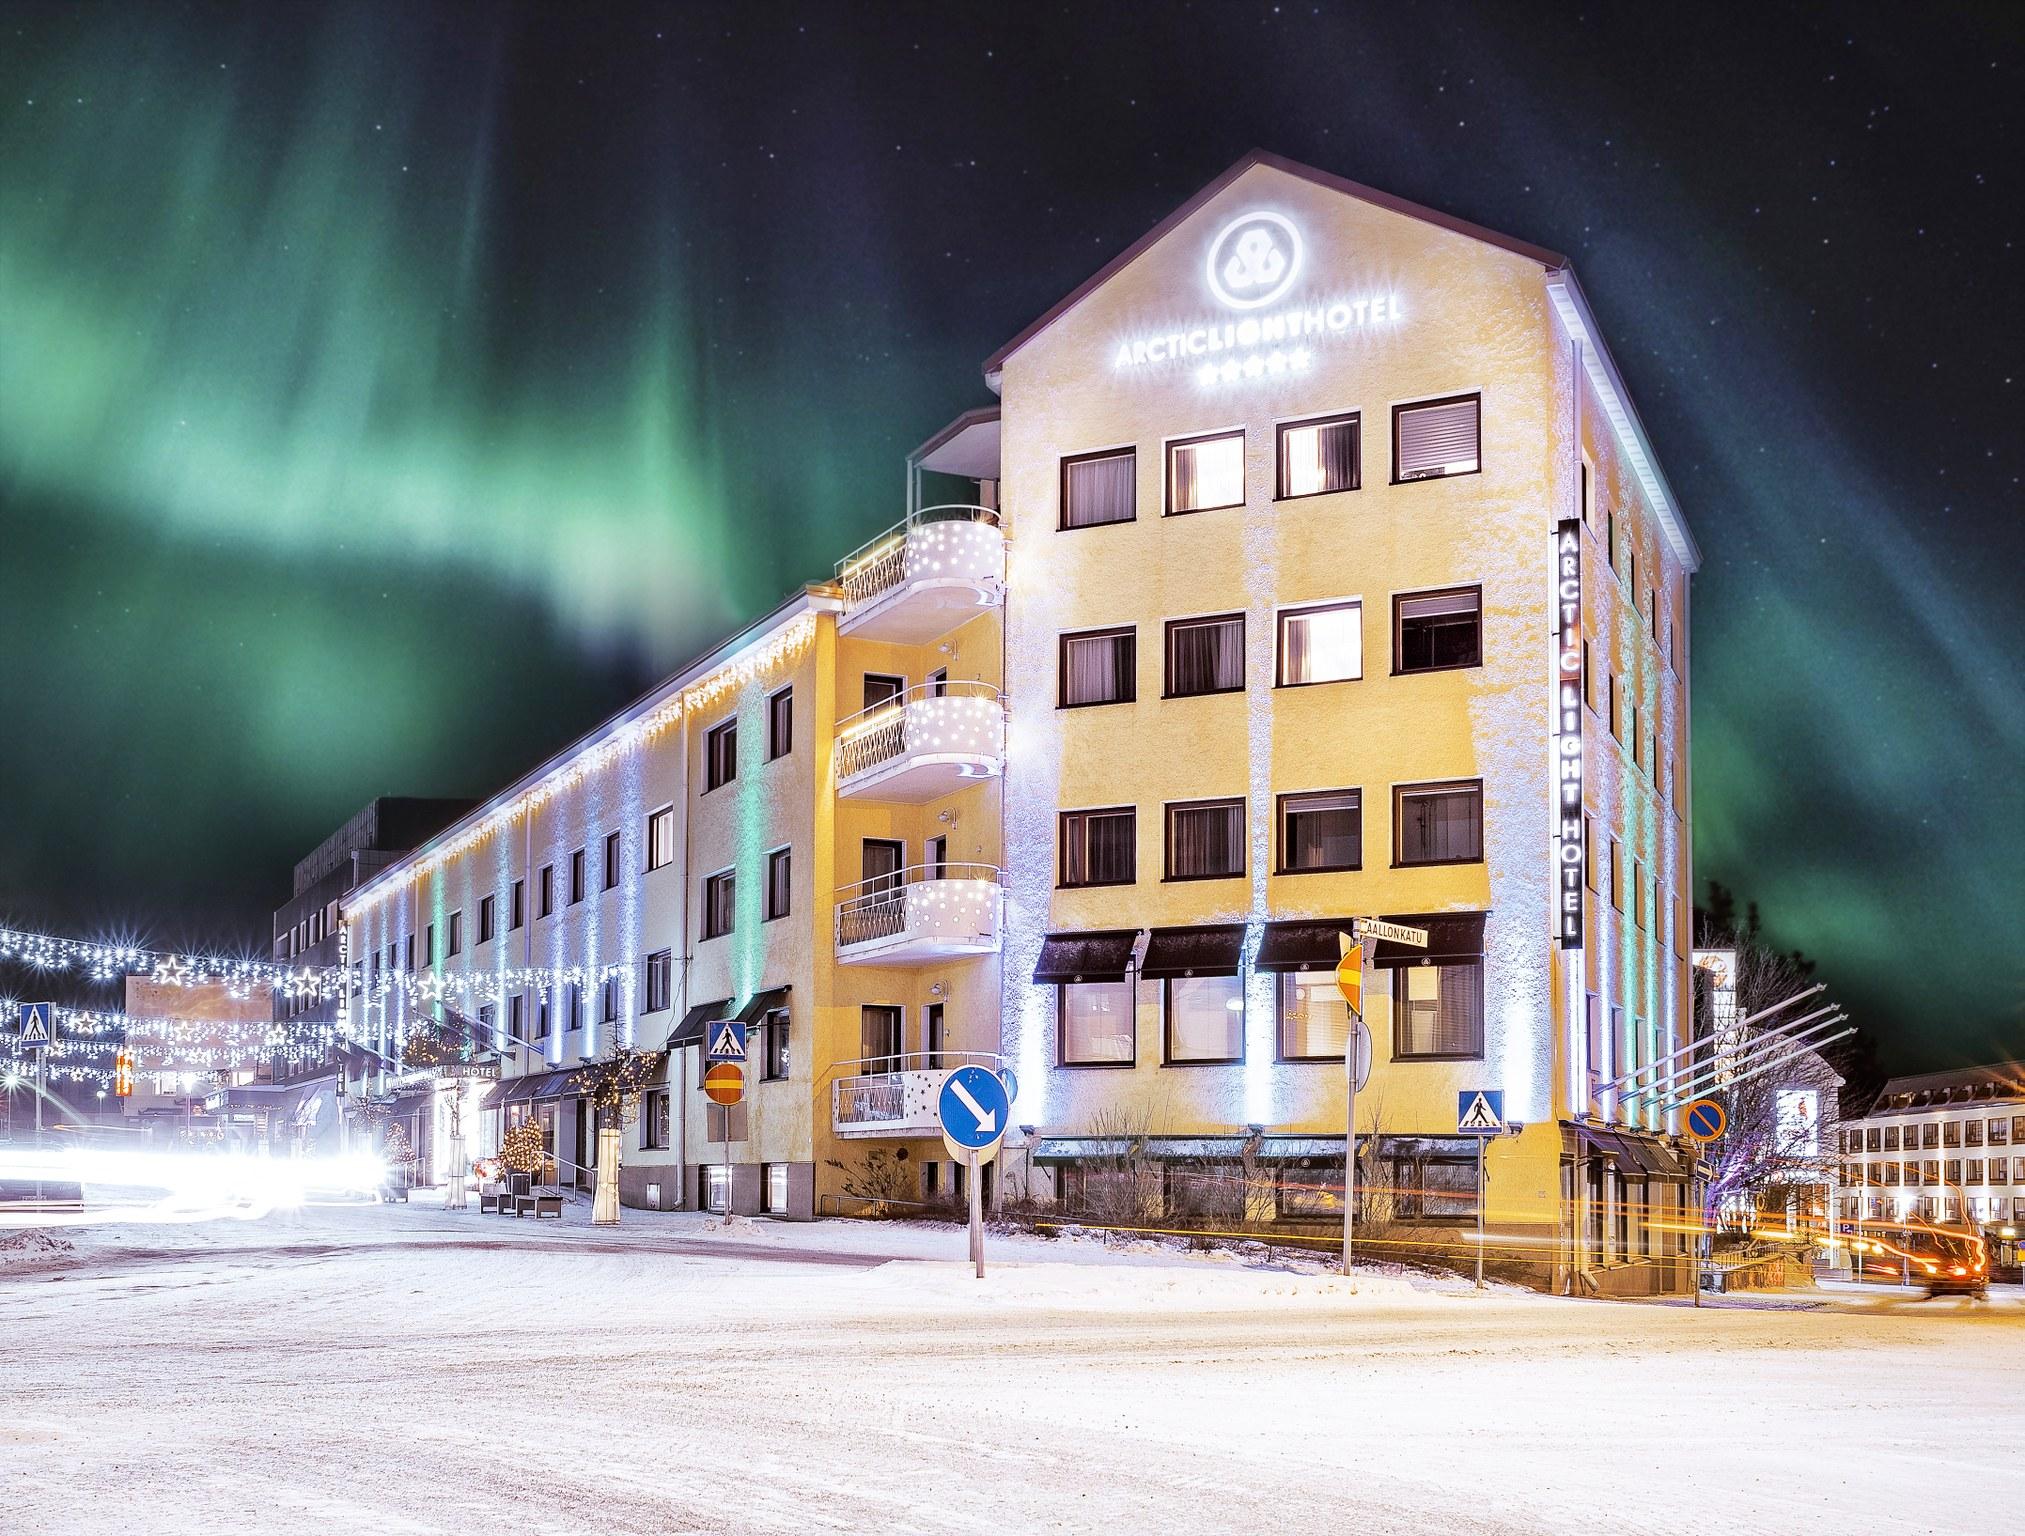 Arctic Light Hotel, Rovaniemi, Lapland, Finland